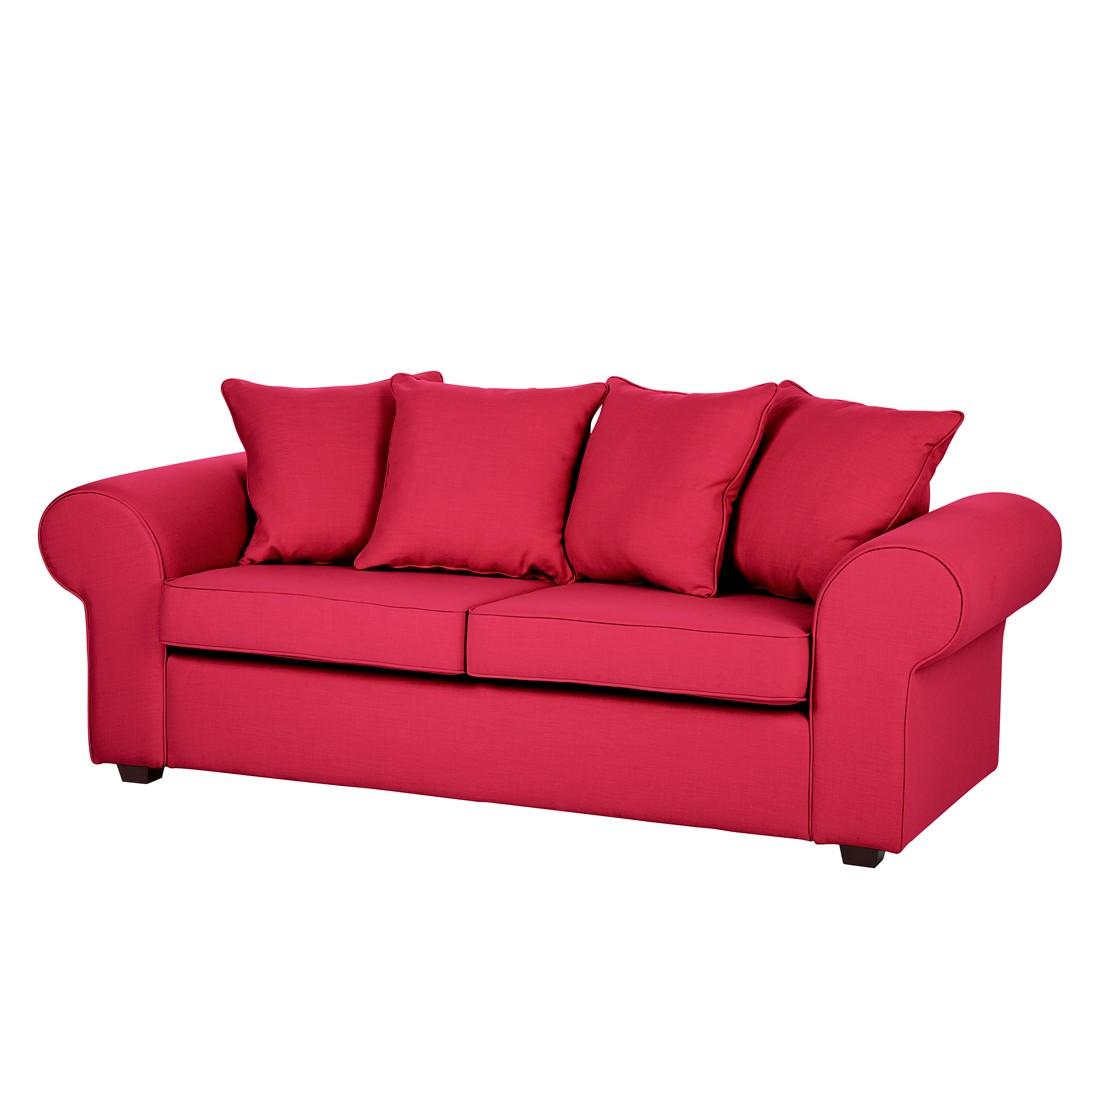 Sofa Colmar (3-Sitzer) – Stoff Pink, Jack & Alice online bestellen